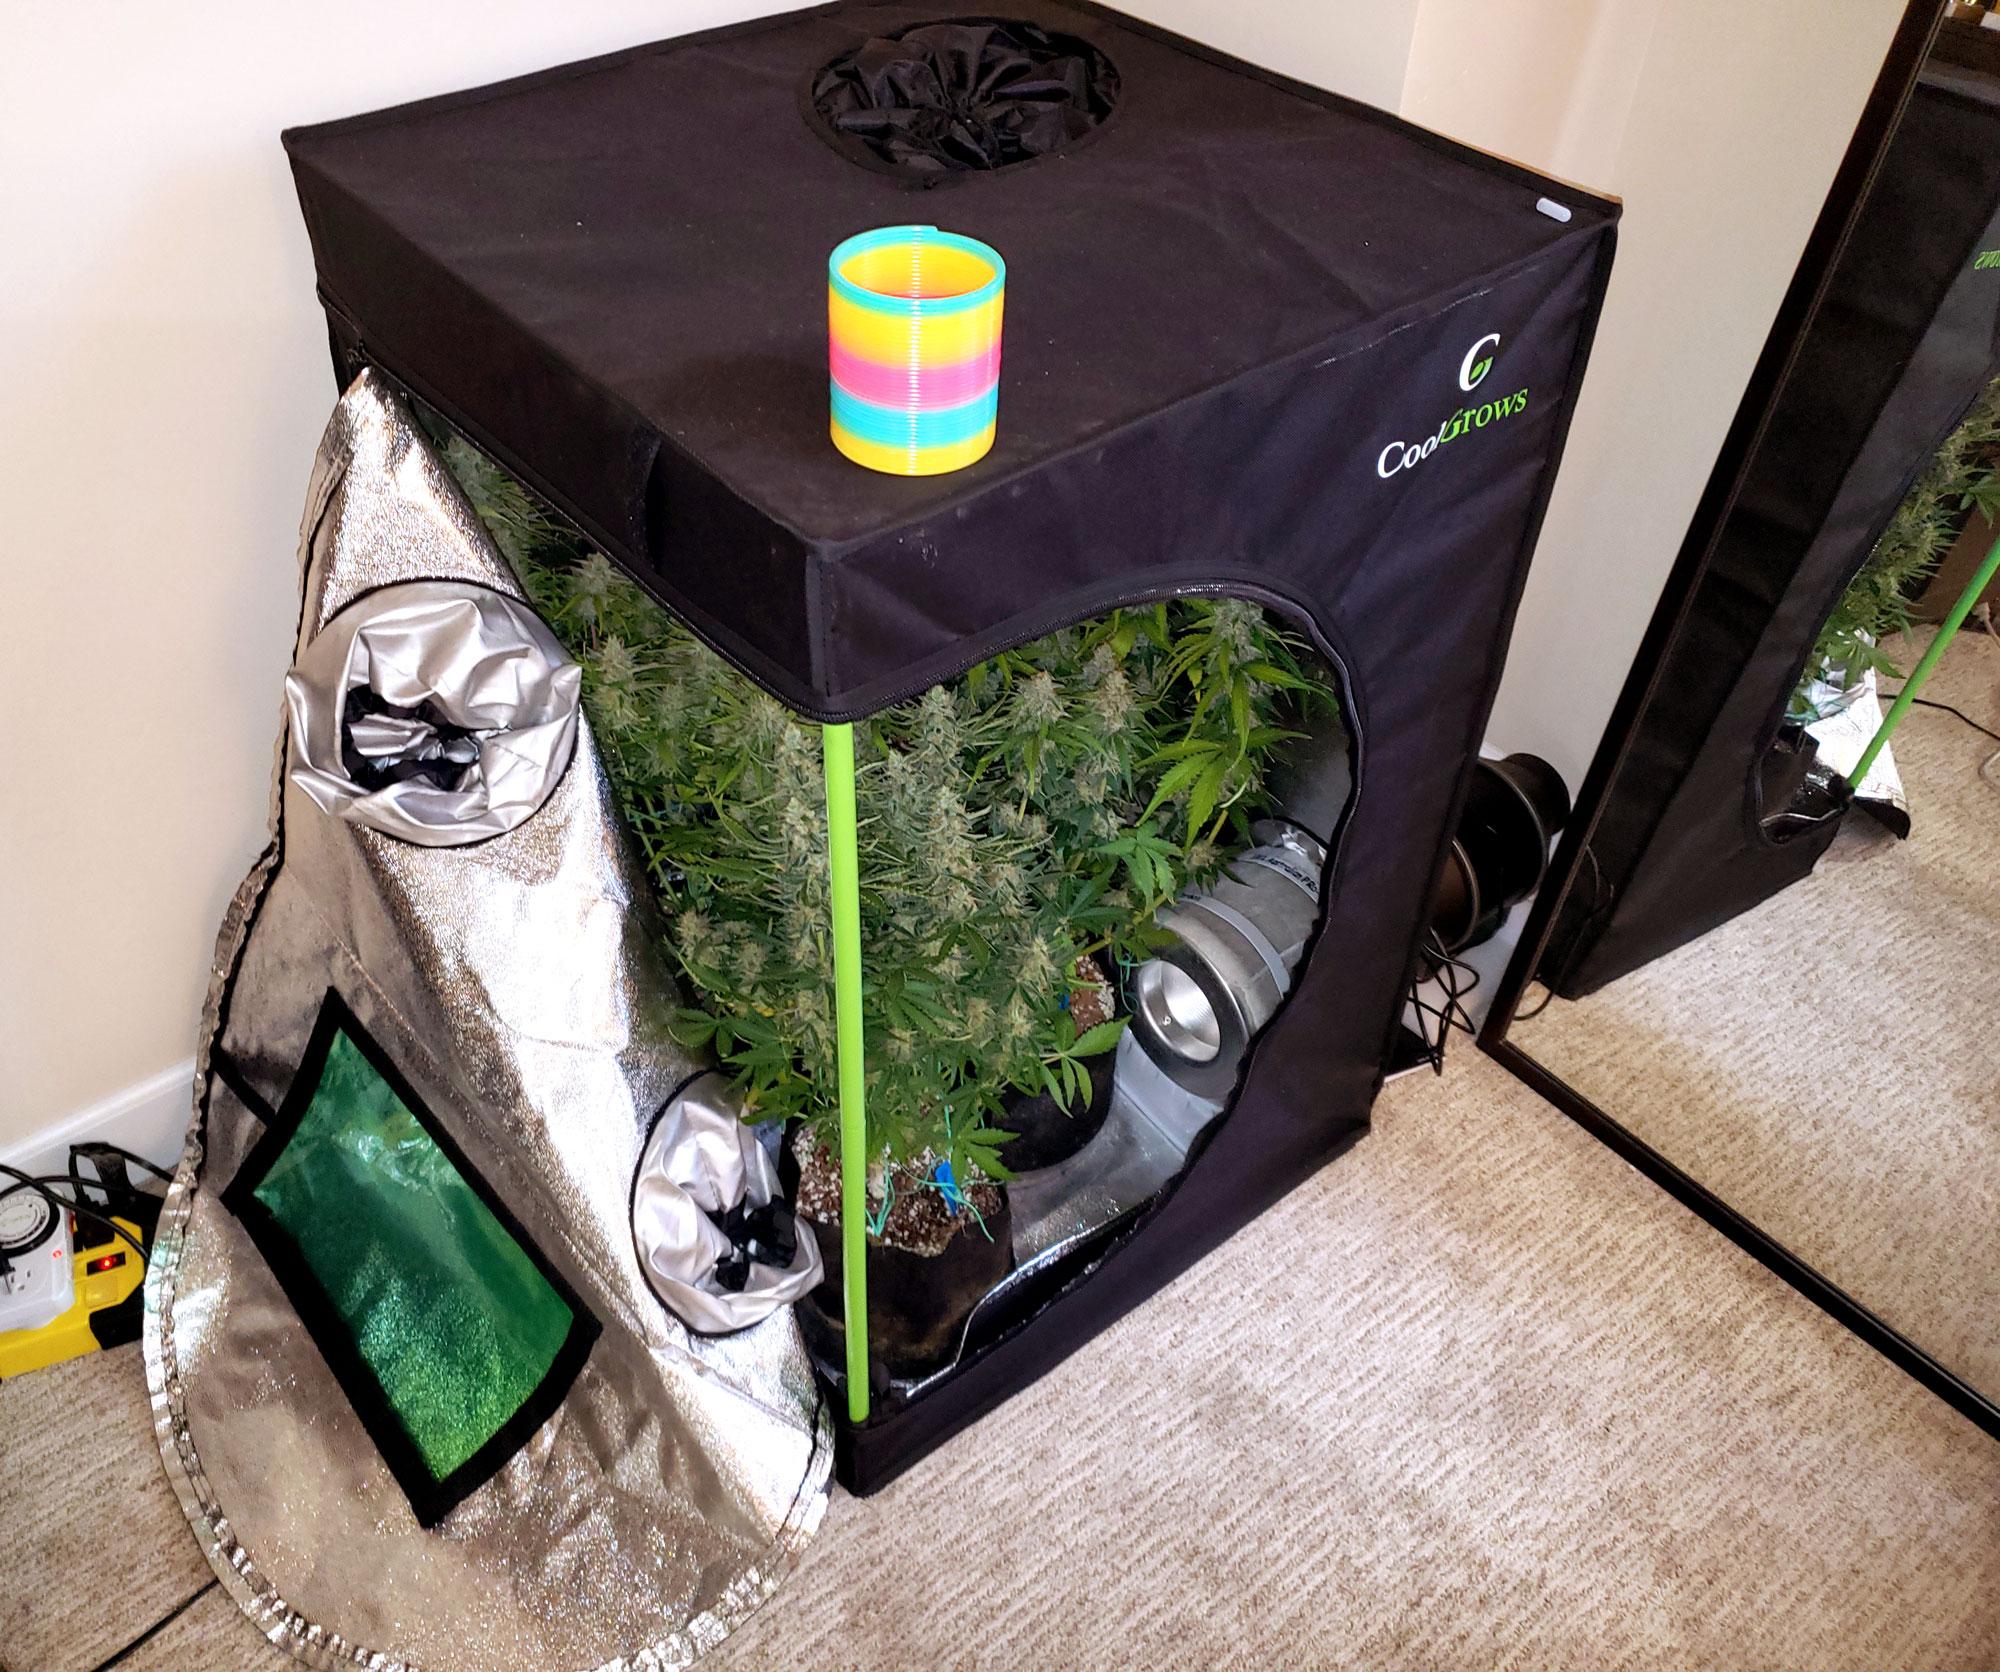 Mini Grow Tent Shopping List Amp Tutorial 100w Led Grow